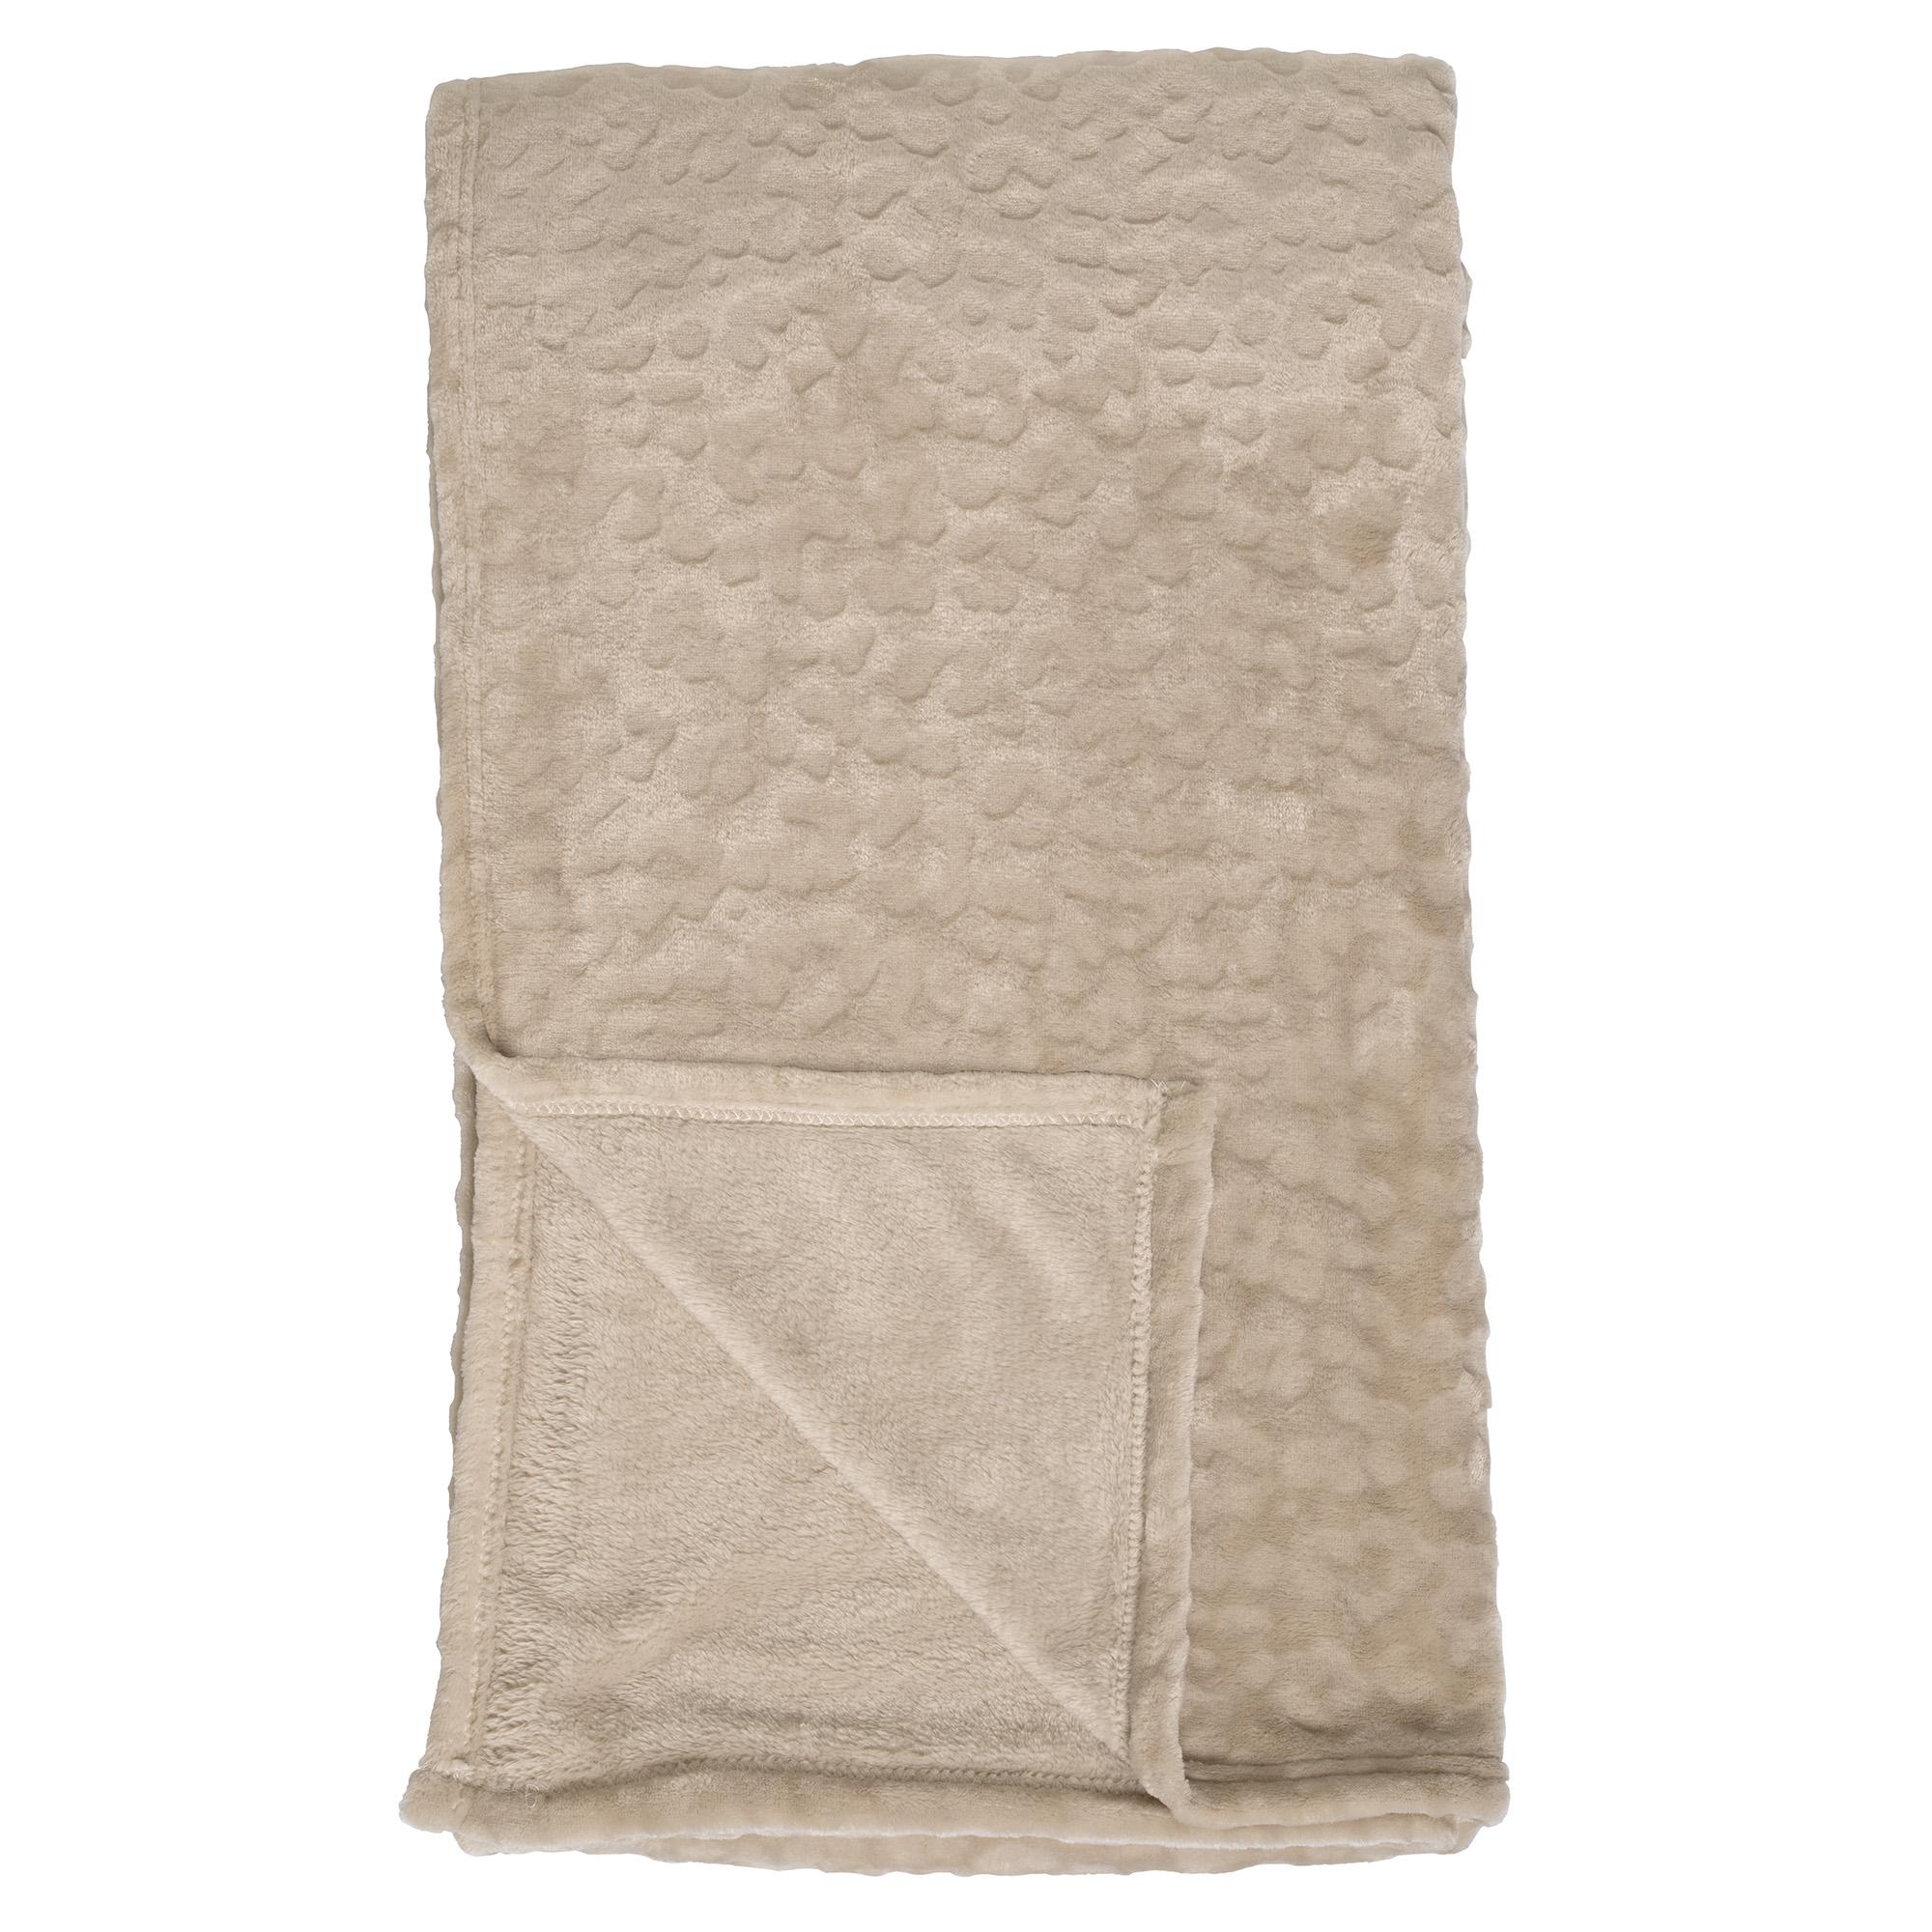 CHESTER - Plaid van fleece 150x200 cm Pumice Stone